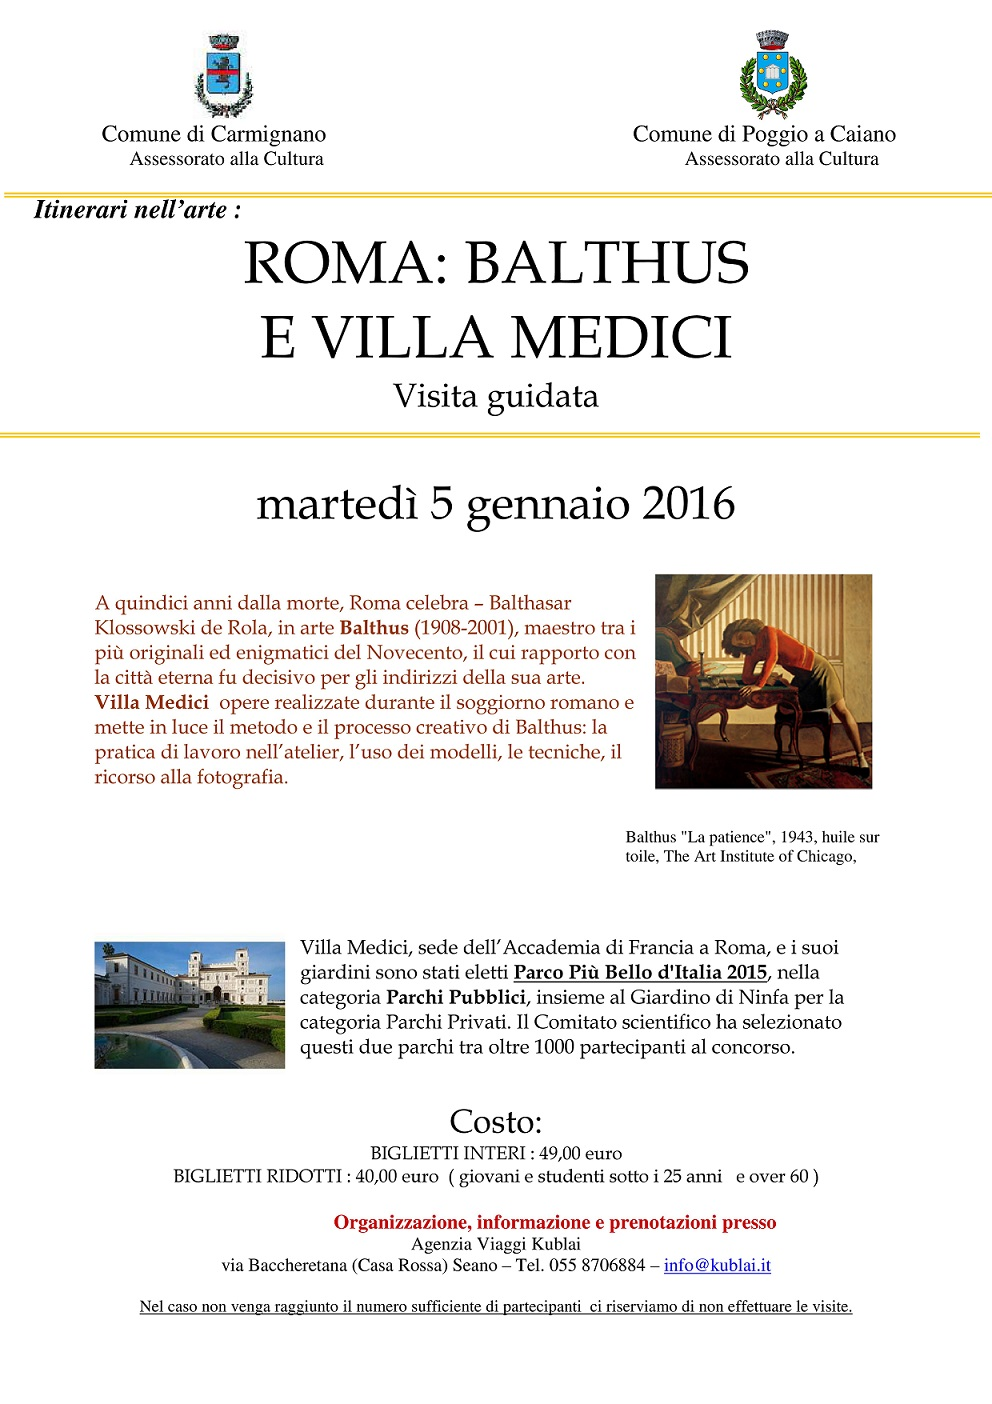 Locandina gita mostra Balthus a Villa Medici